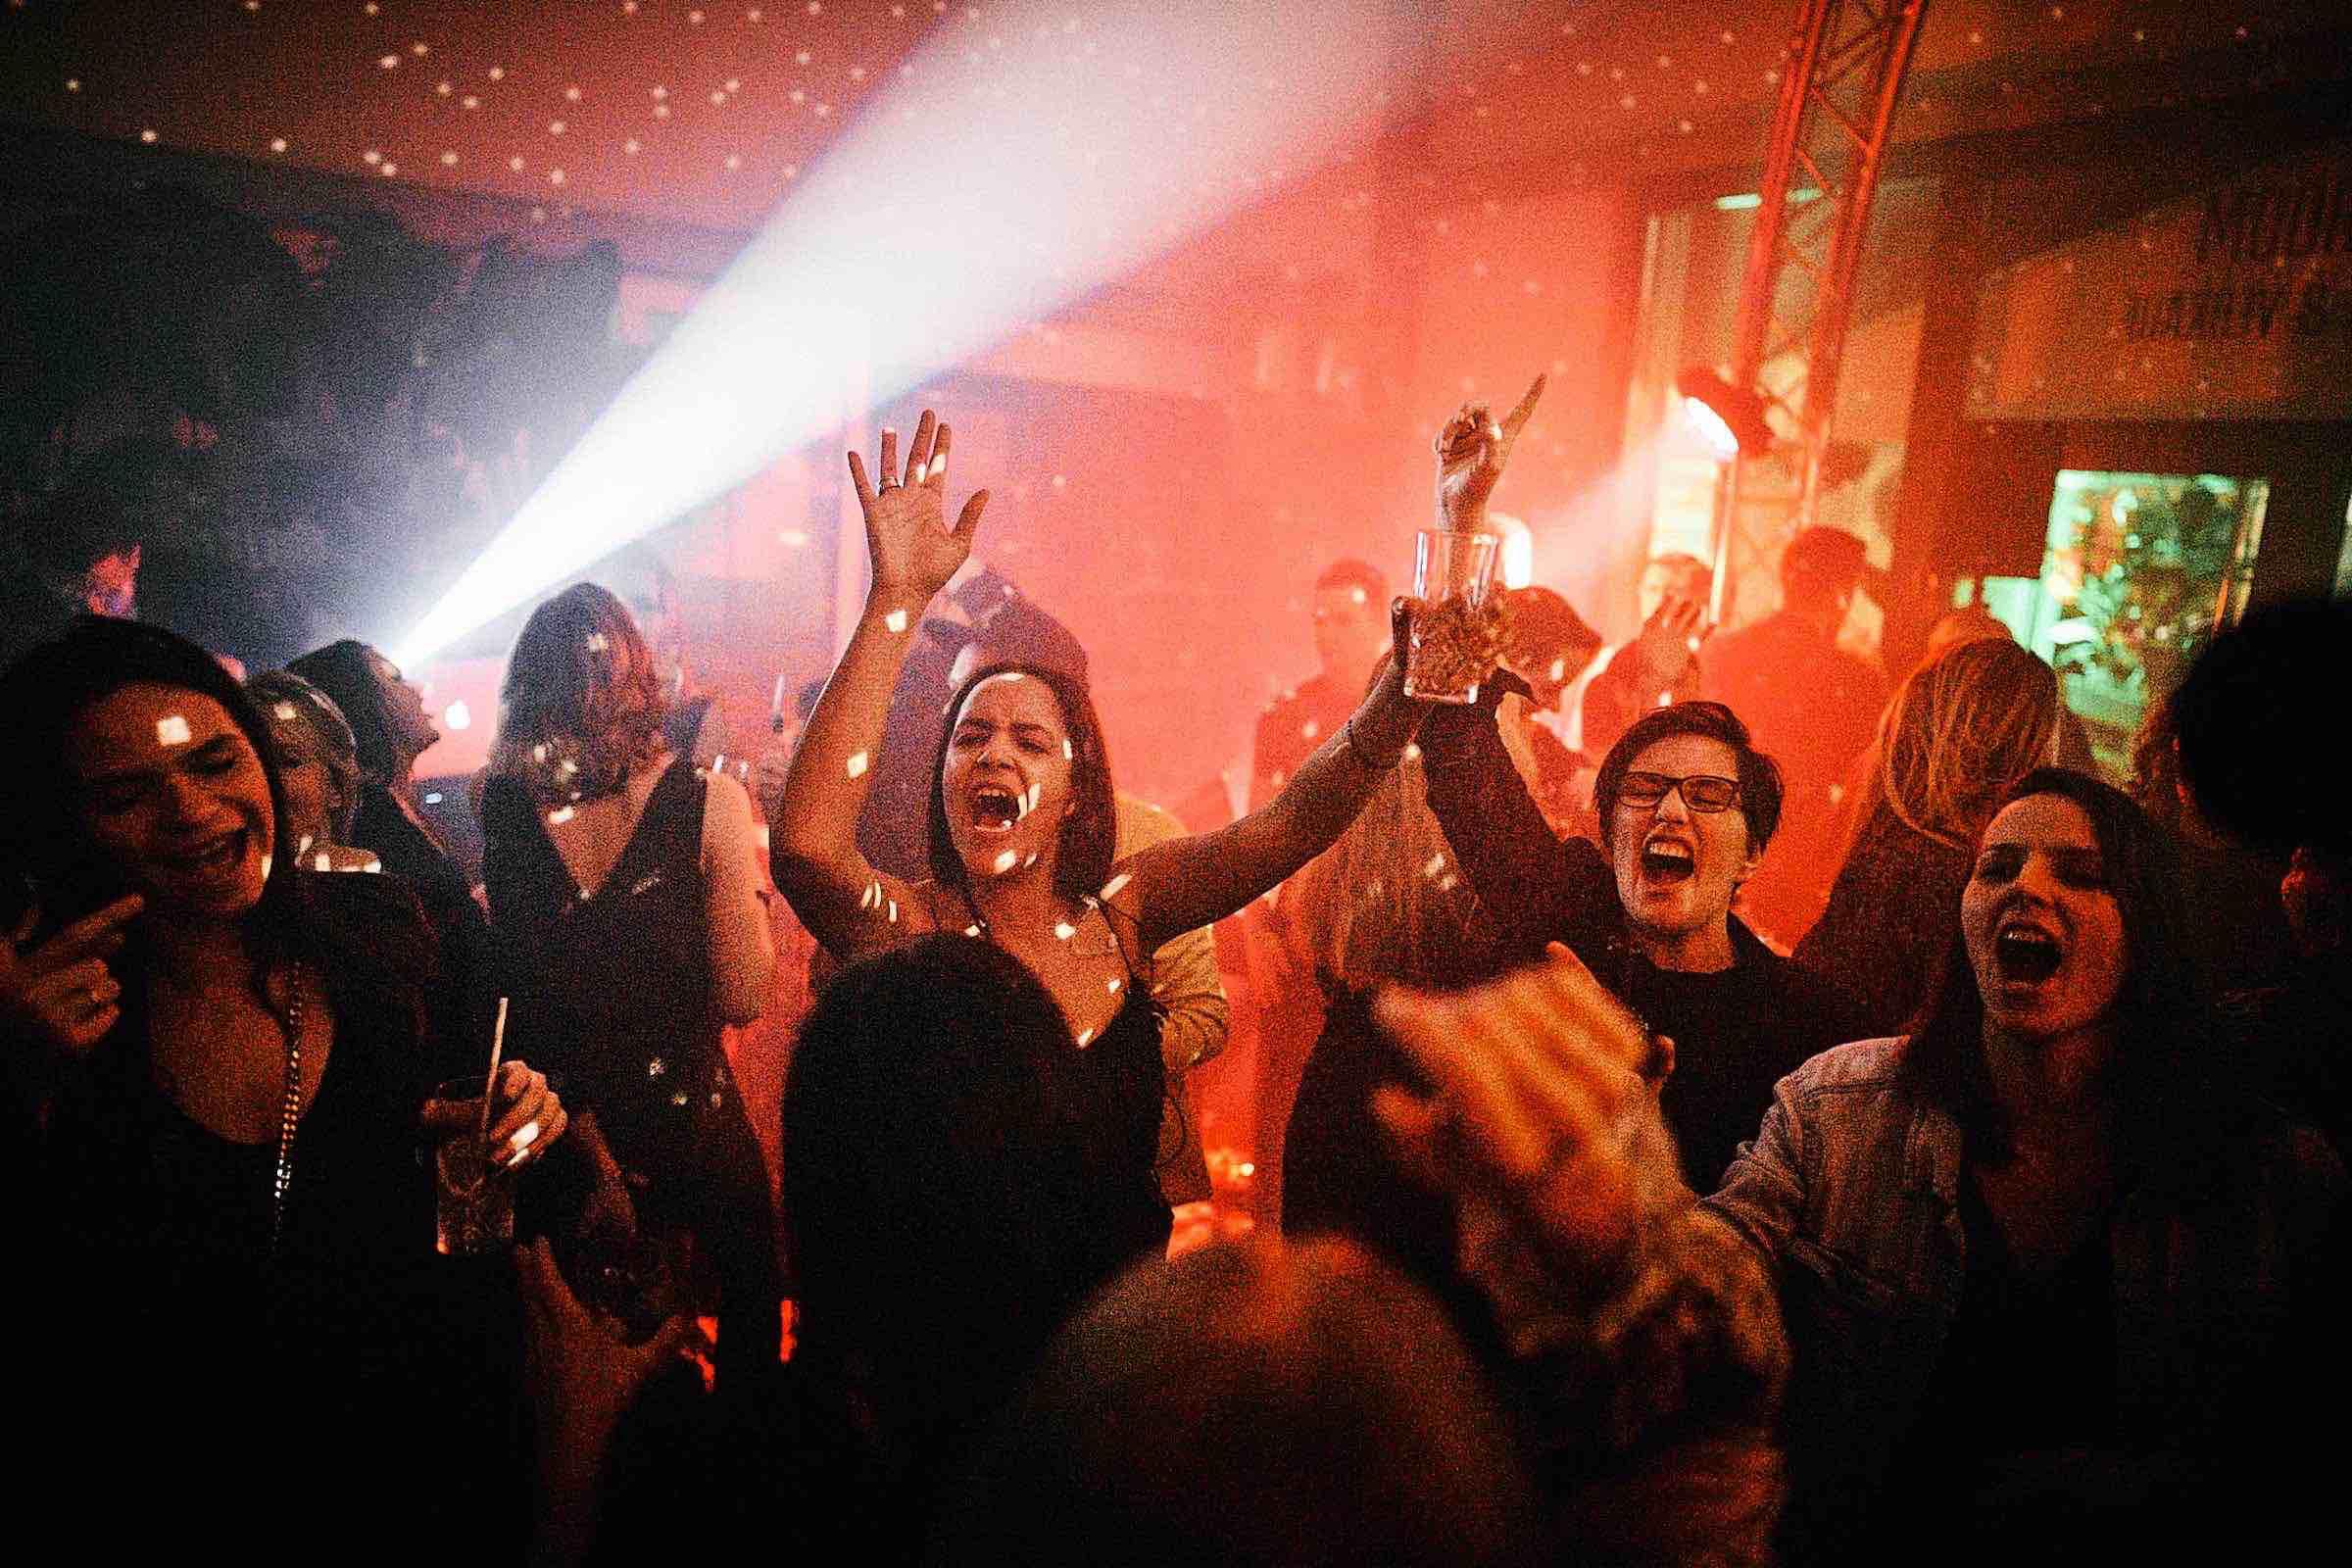 DJ | Hochzeit | DJ | Agentur | DJ | Service | Hamburg | DJ | Feier | Hochzeits | DJ | Messe | DJ | Firmenevent | Firmenfeier | DJ | Geburtstag | Discjockey | Weihnachtsfeier | DJ | Sommerfest | Event | Buchen | Mieten | Hamburgfeiert